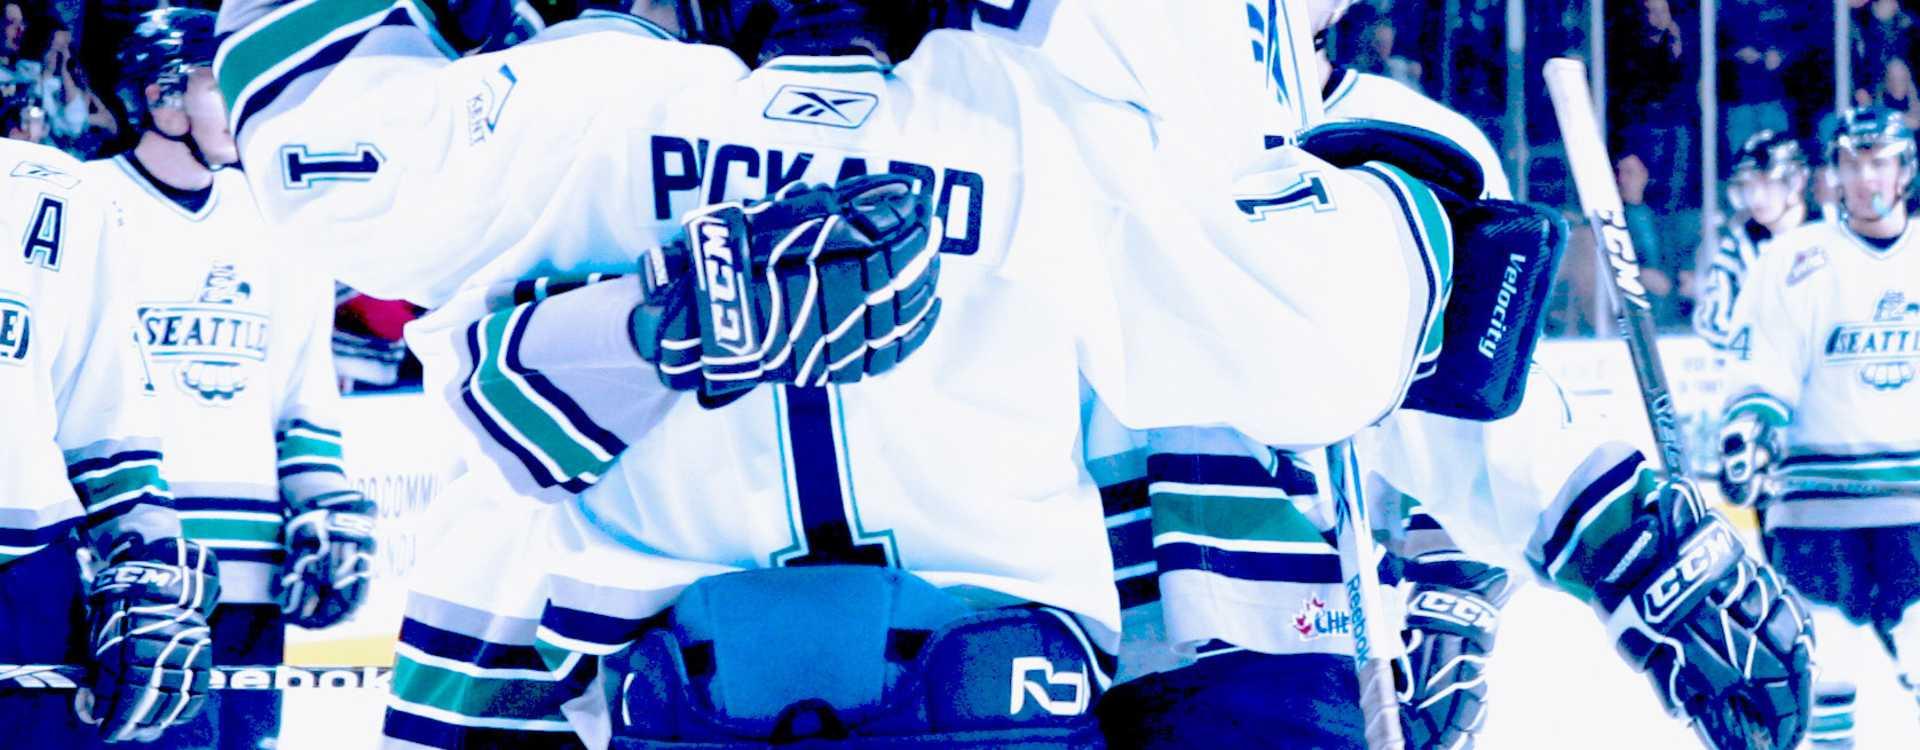 Seattle_Thunderbirds_Hockey-2.bmp